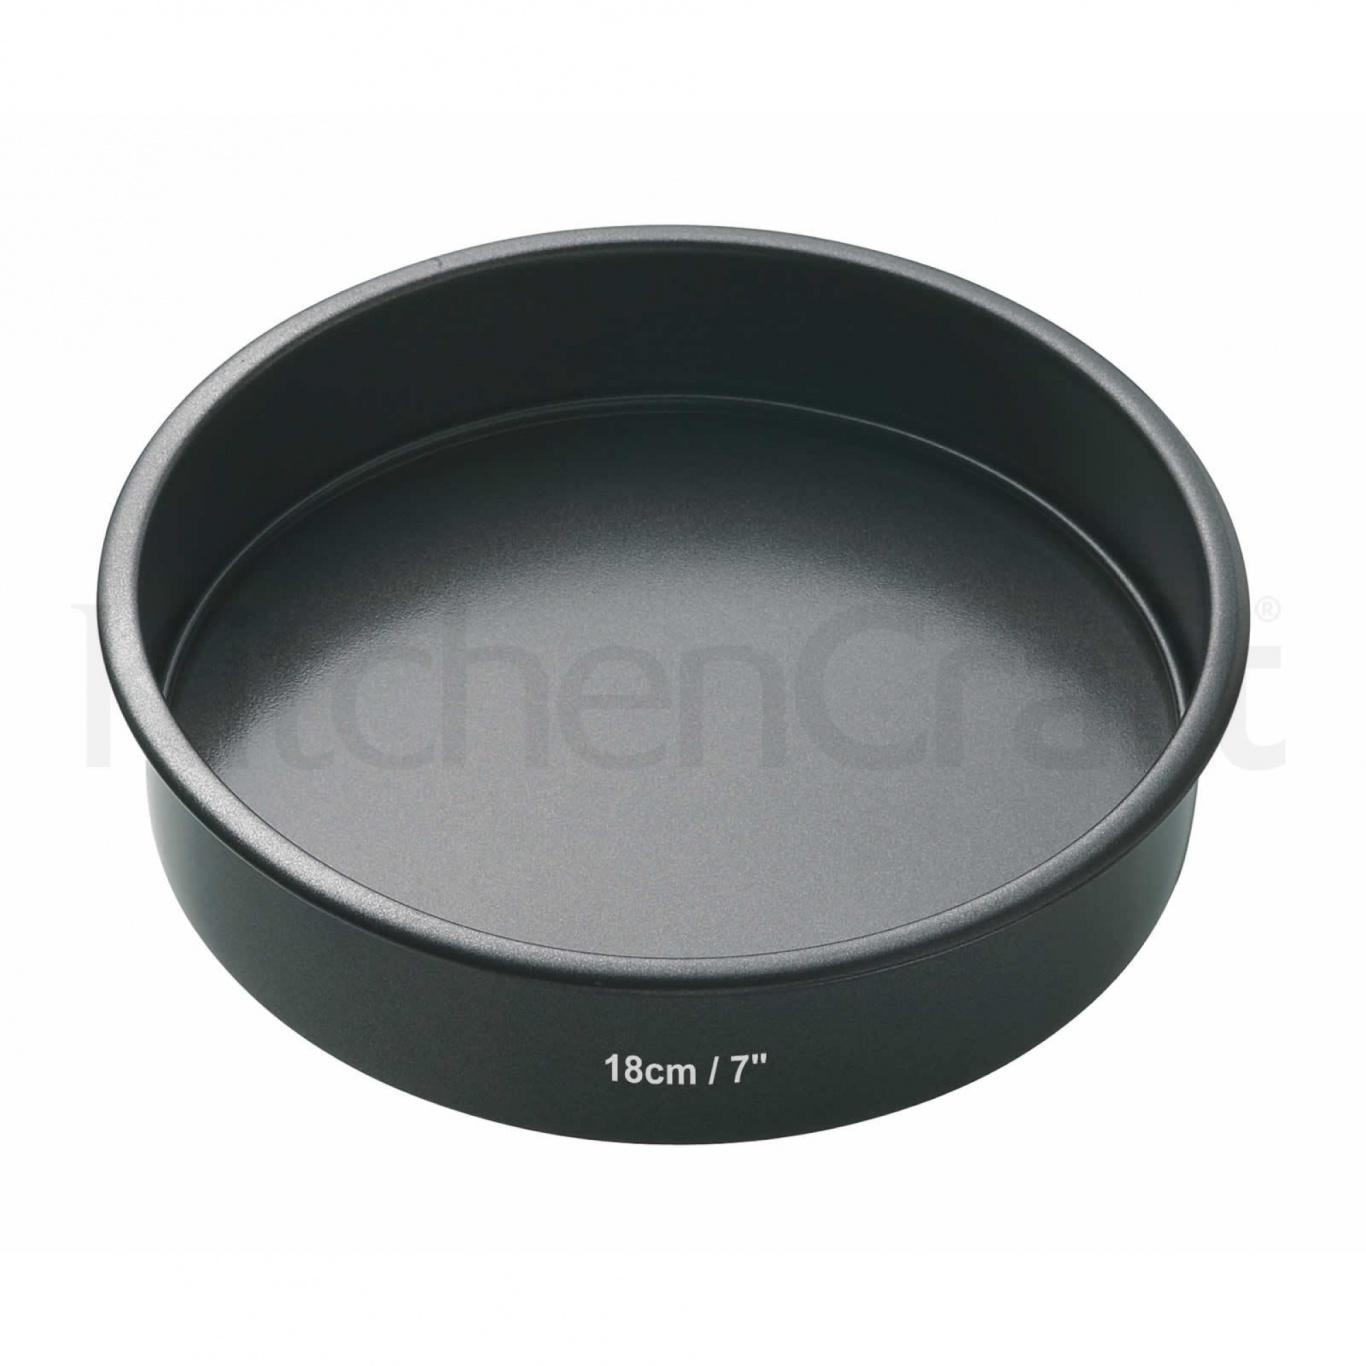 Image of Non Stick Round Sandwich Pan 18cm/7ins